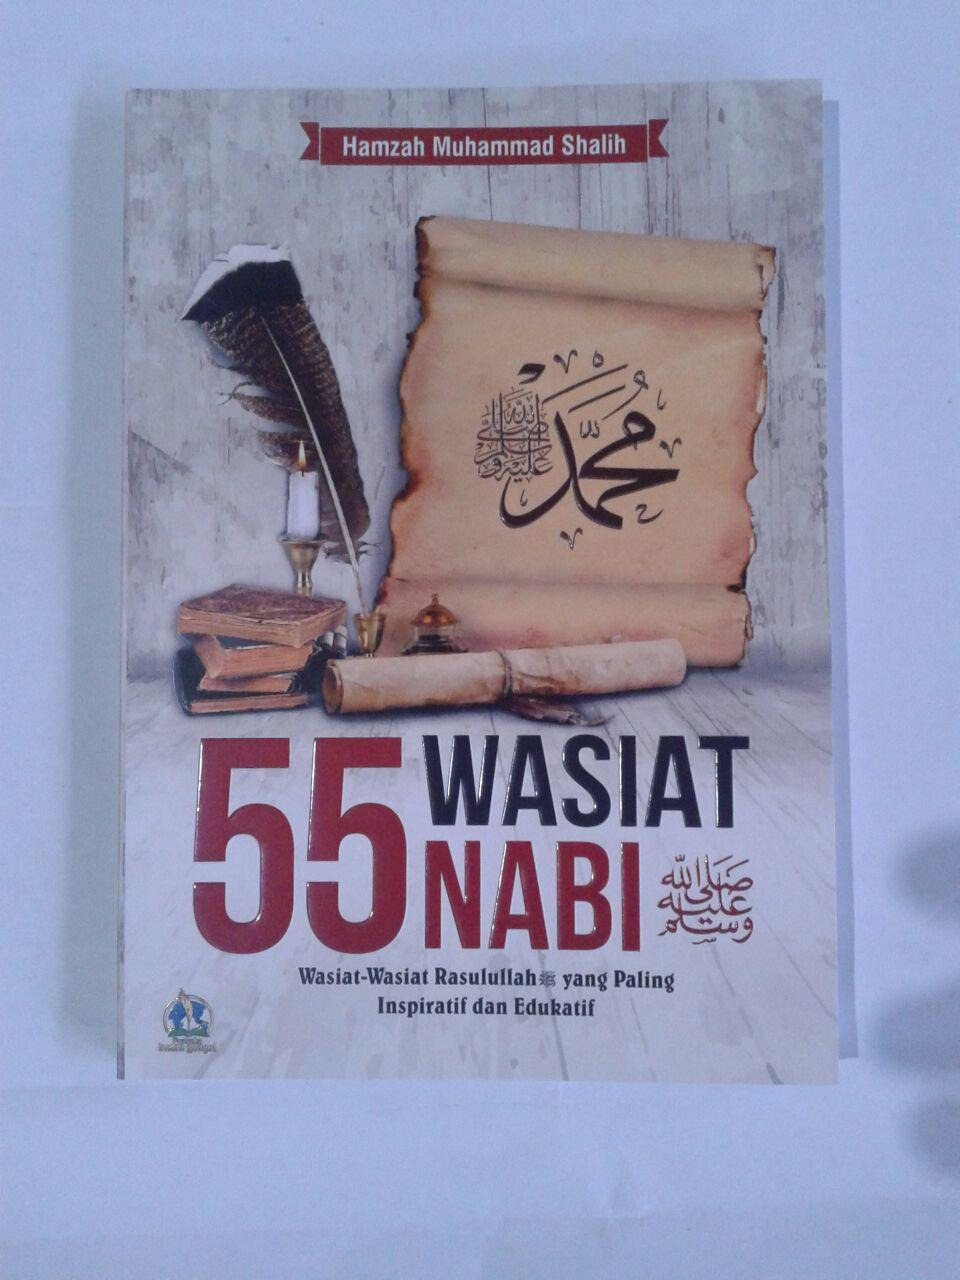 Buku 55 Wasiat Nabi Yang Paling Inspiratif Dan Edukatif cover 2